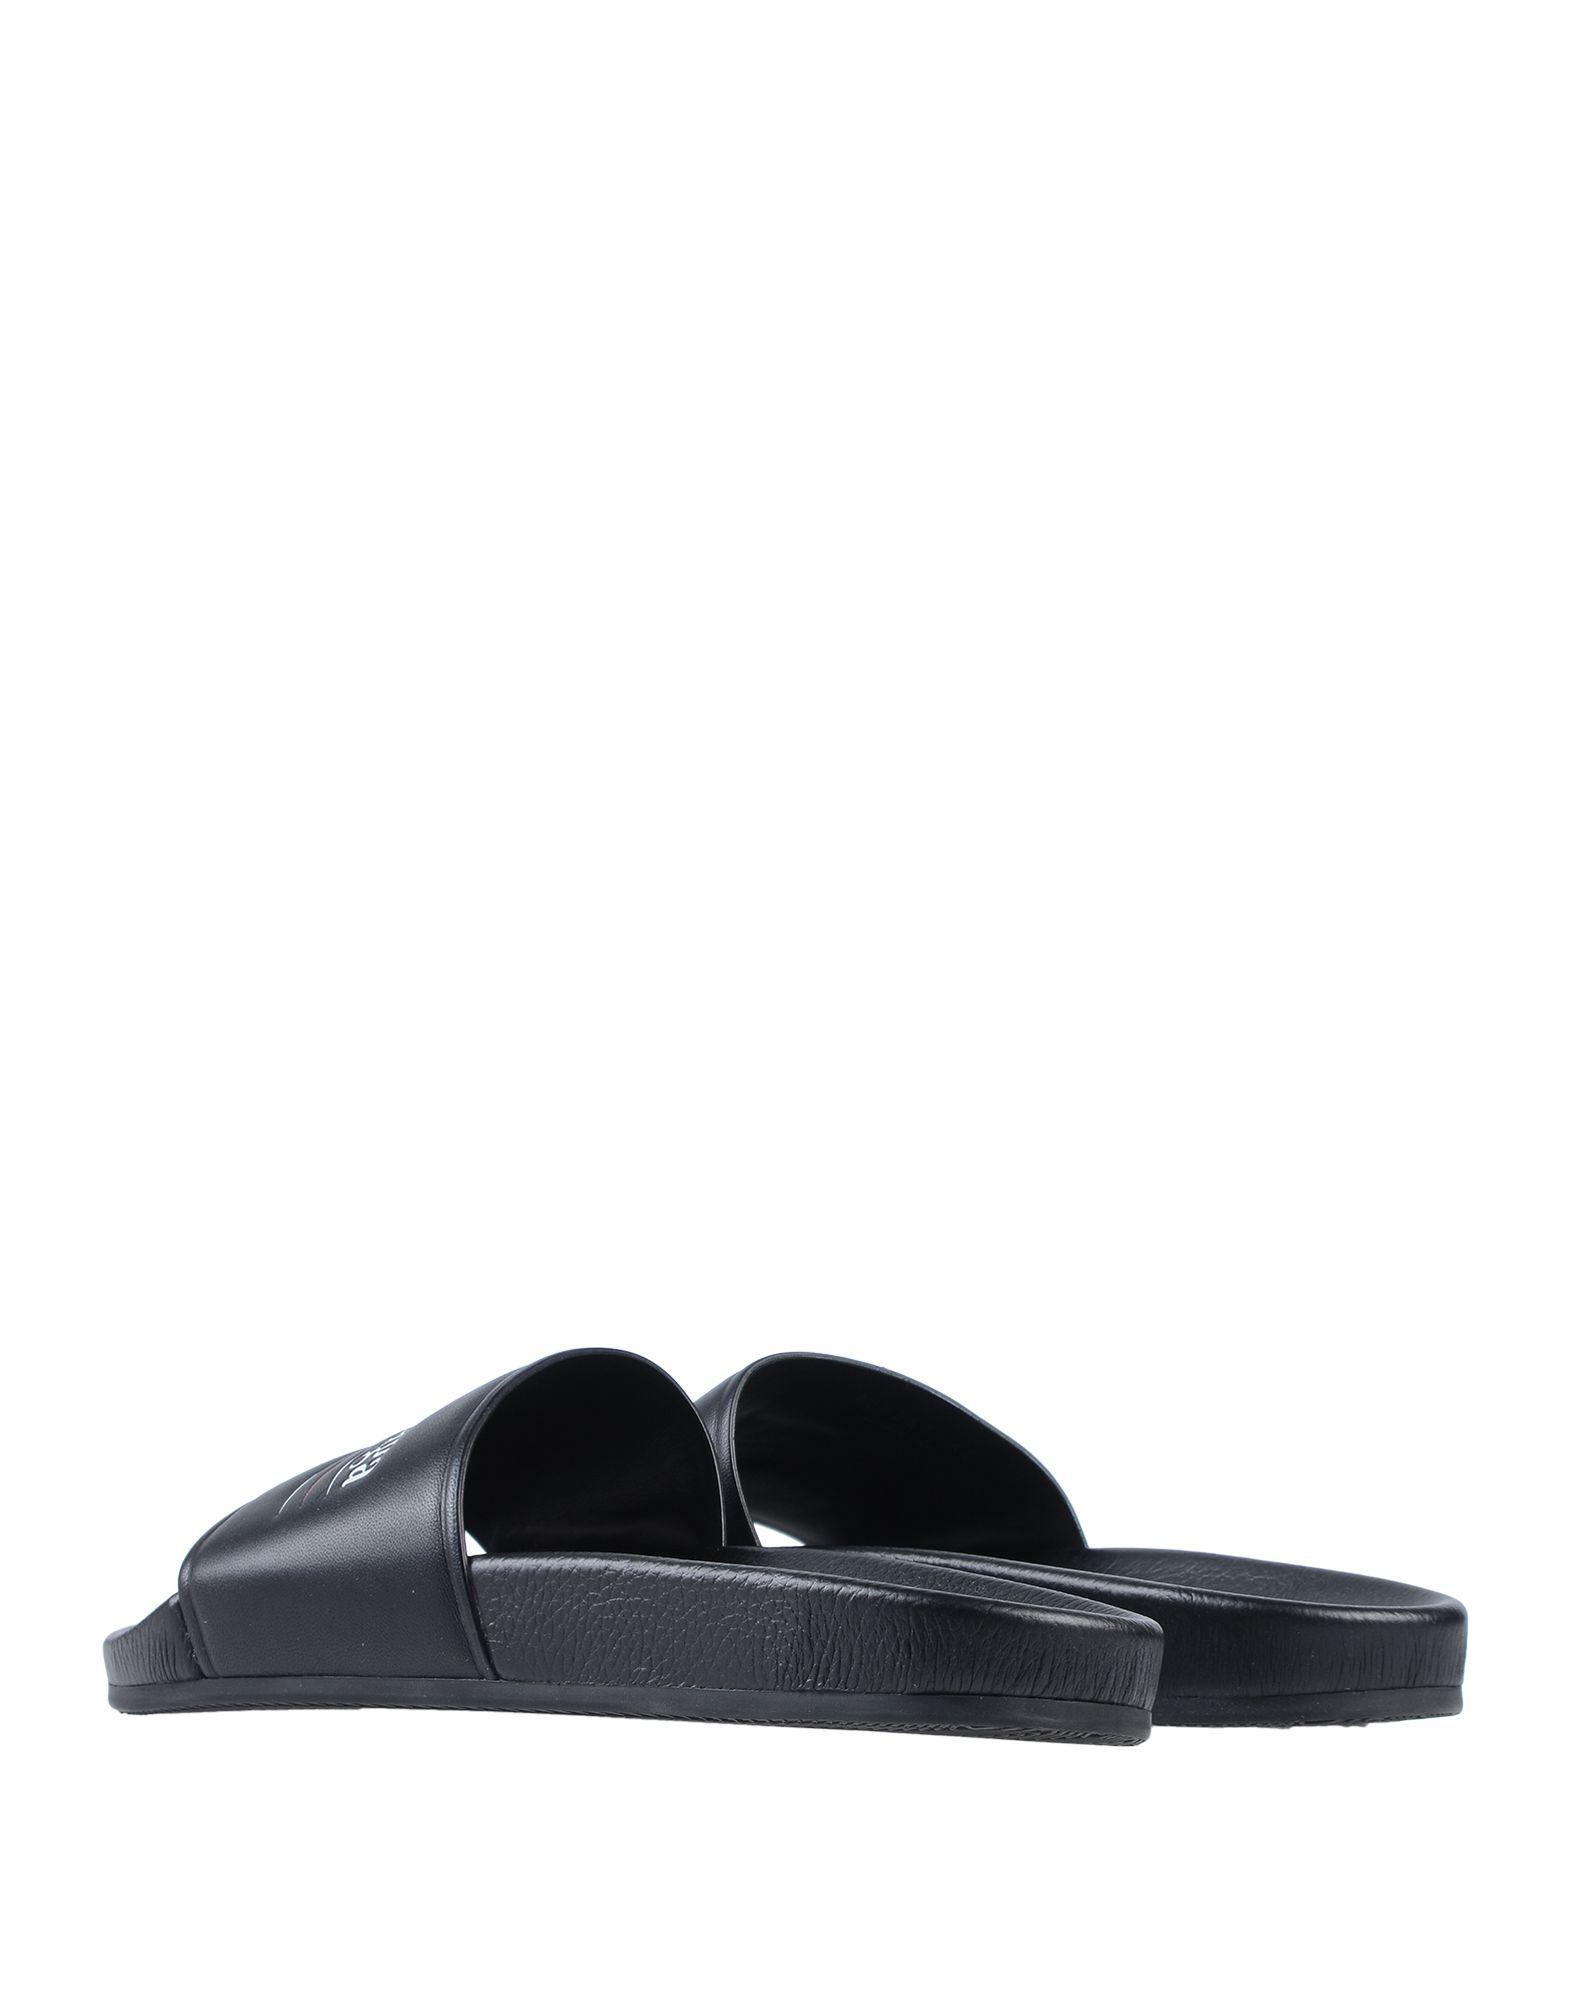 a9ec82df17d0 Balenciaga Logo Print Slides in Black for Men - Save 57% - Lyst